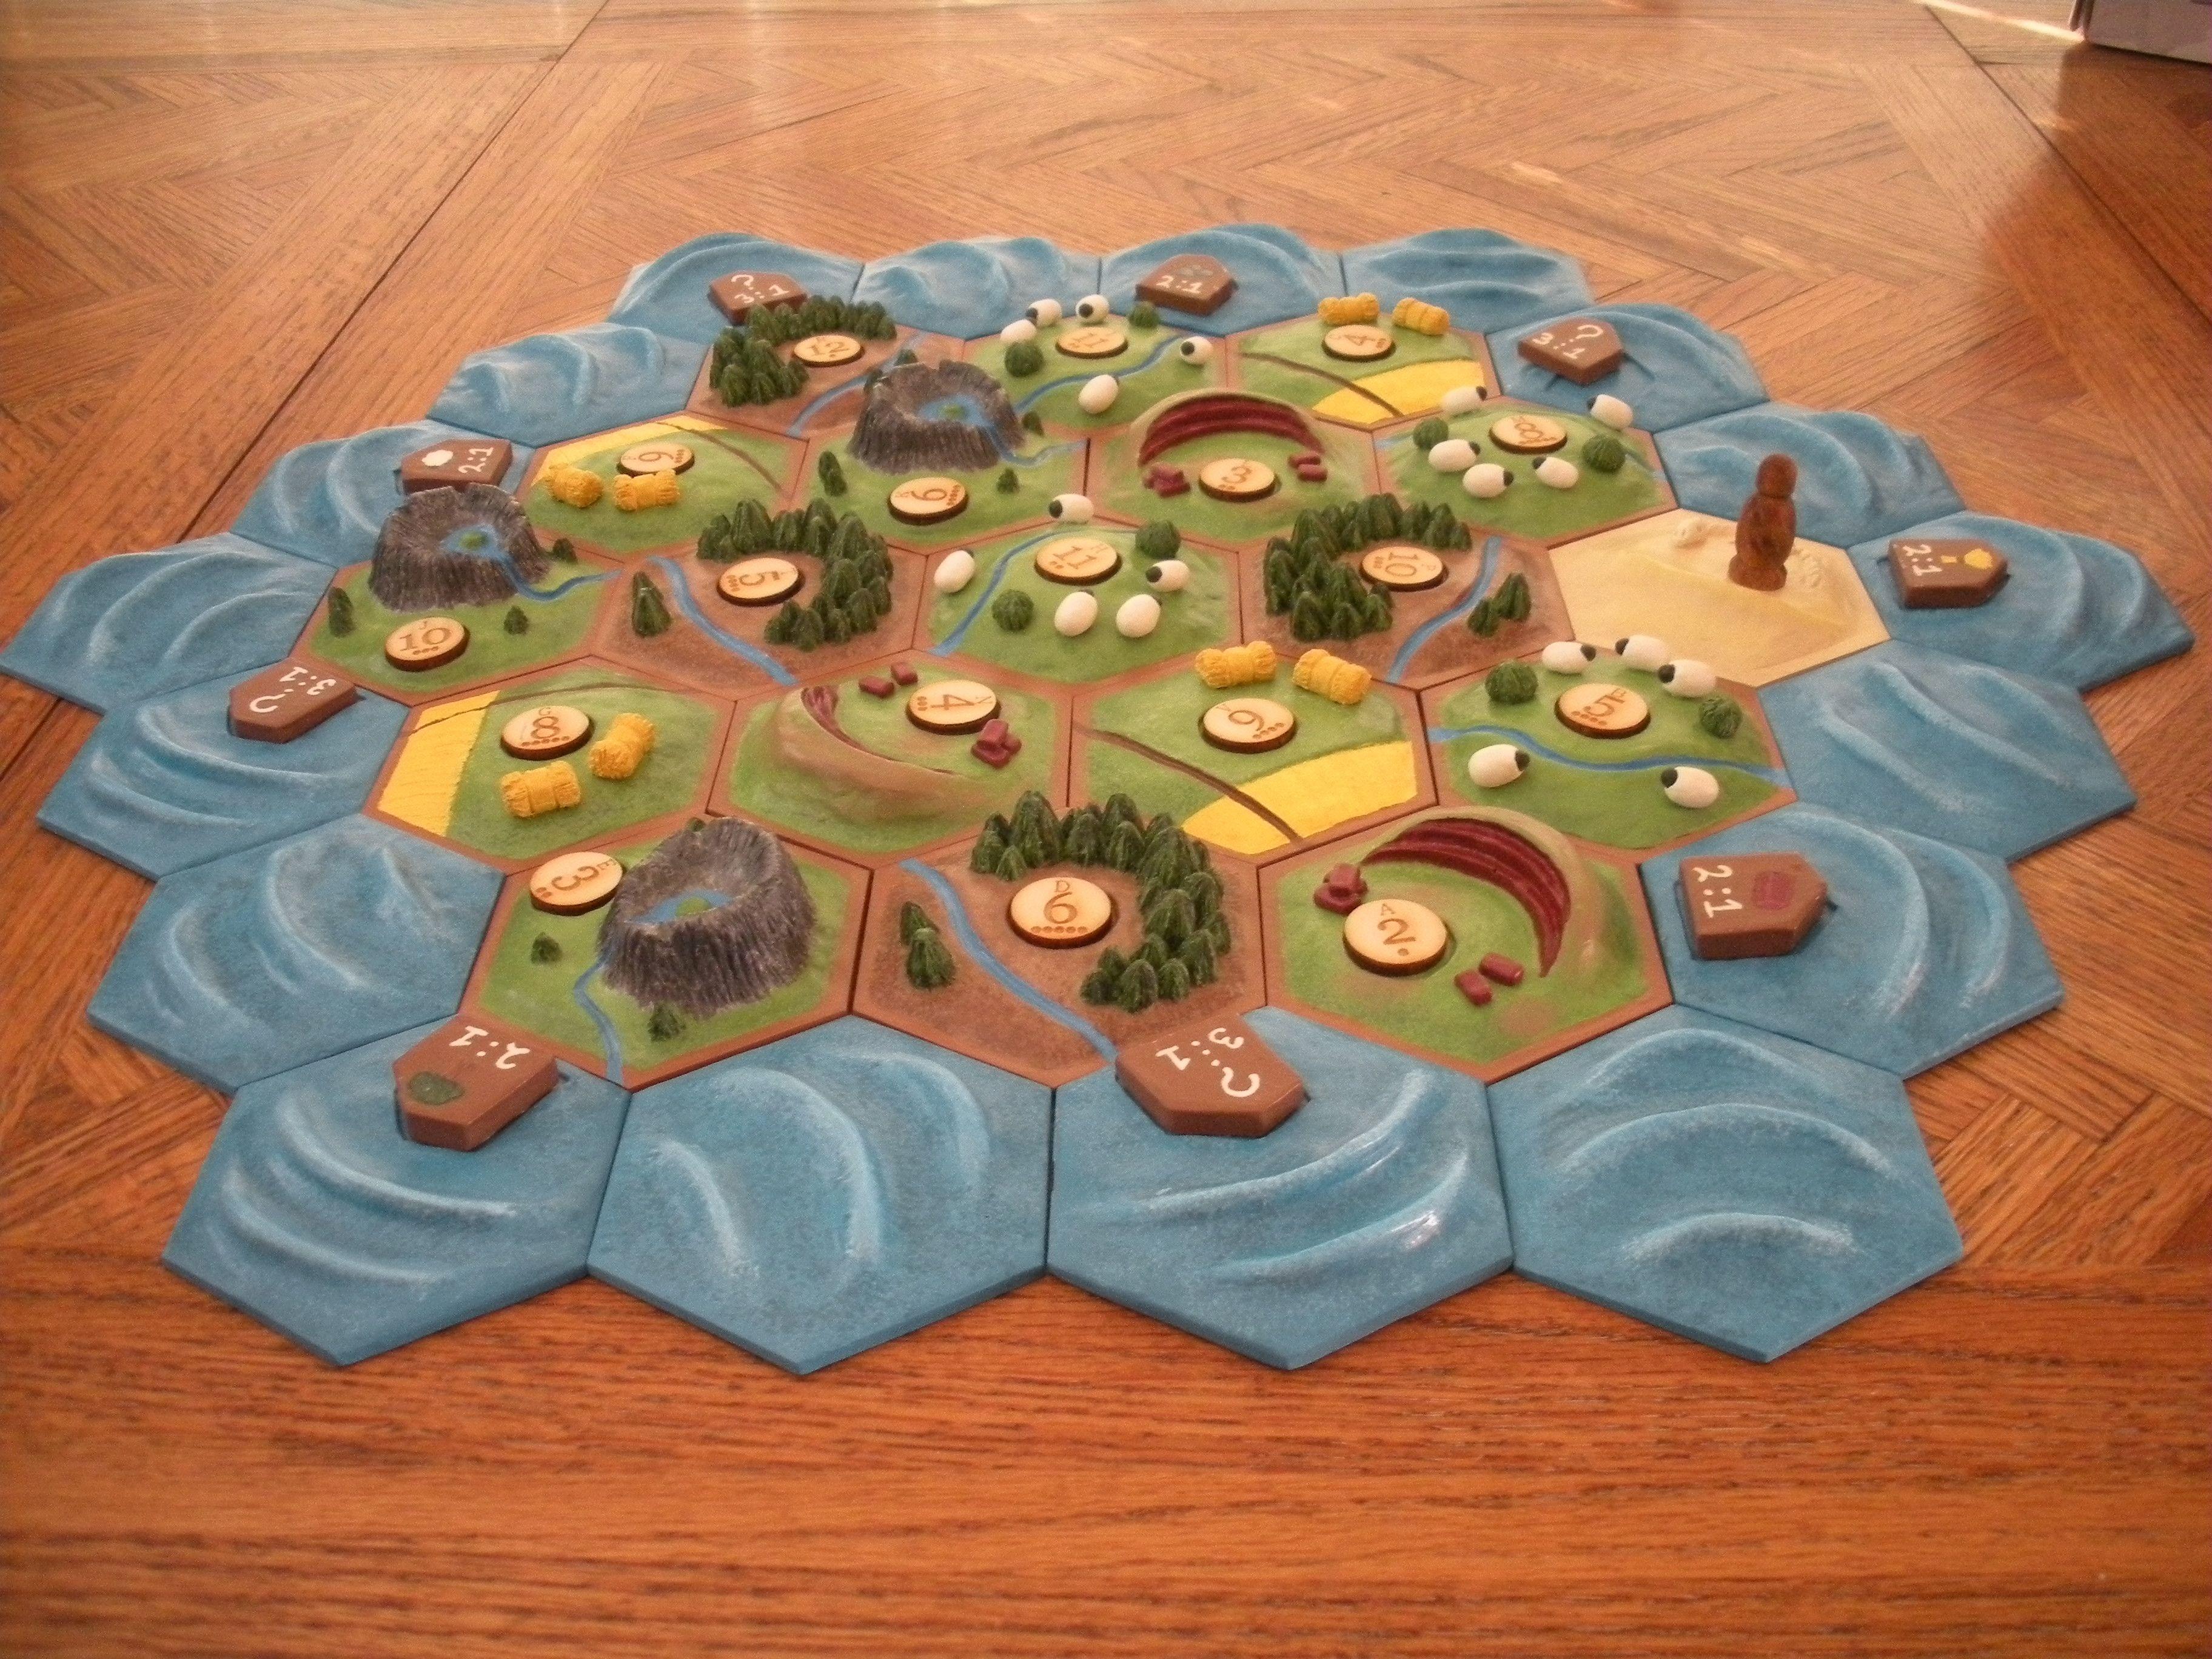 Hachi6's custom Catan board! Catan board, Settlers of